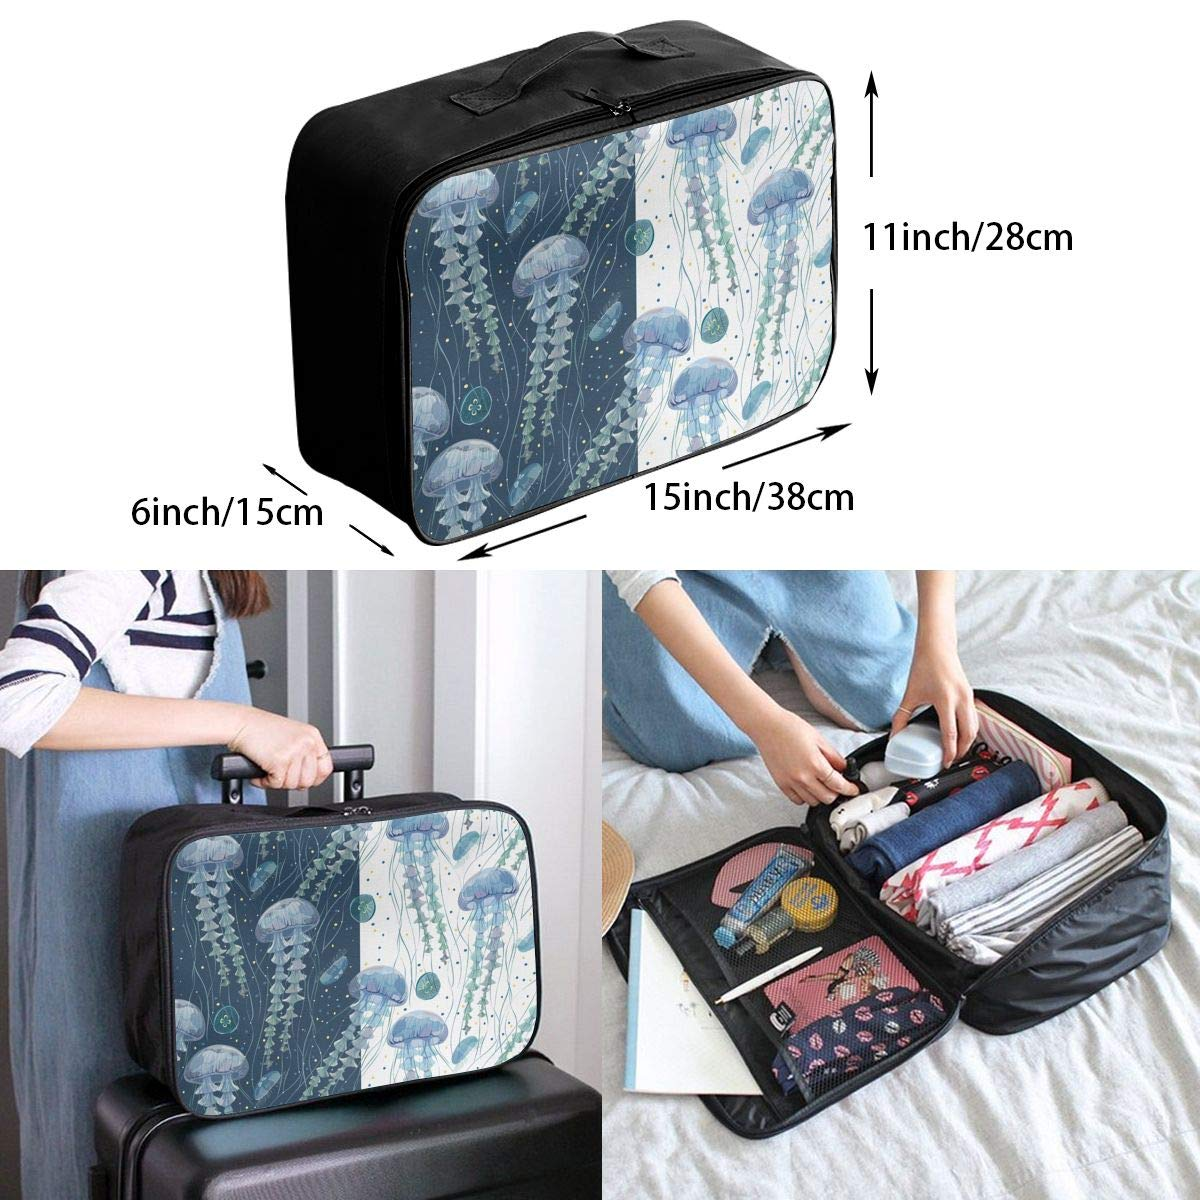 YINLAN Foldable Multifunctional Waterproof Duffel Travel Storage Bag Color Elephant Pattern Lightweight Large Capacity Portable Luggage Bag